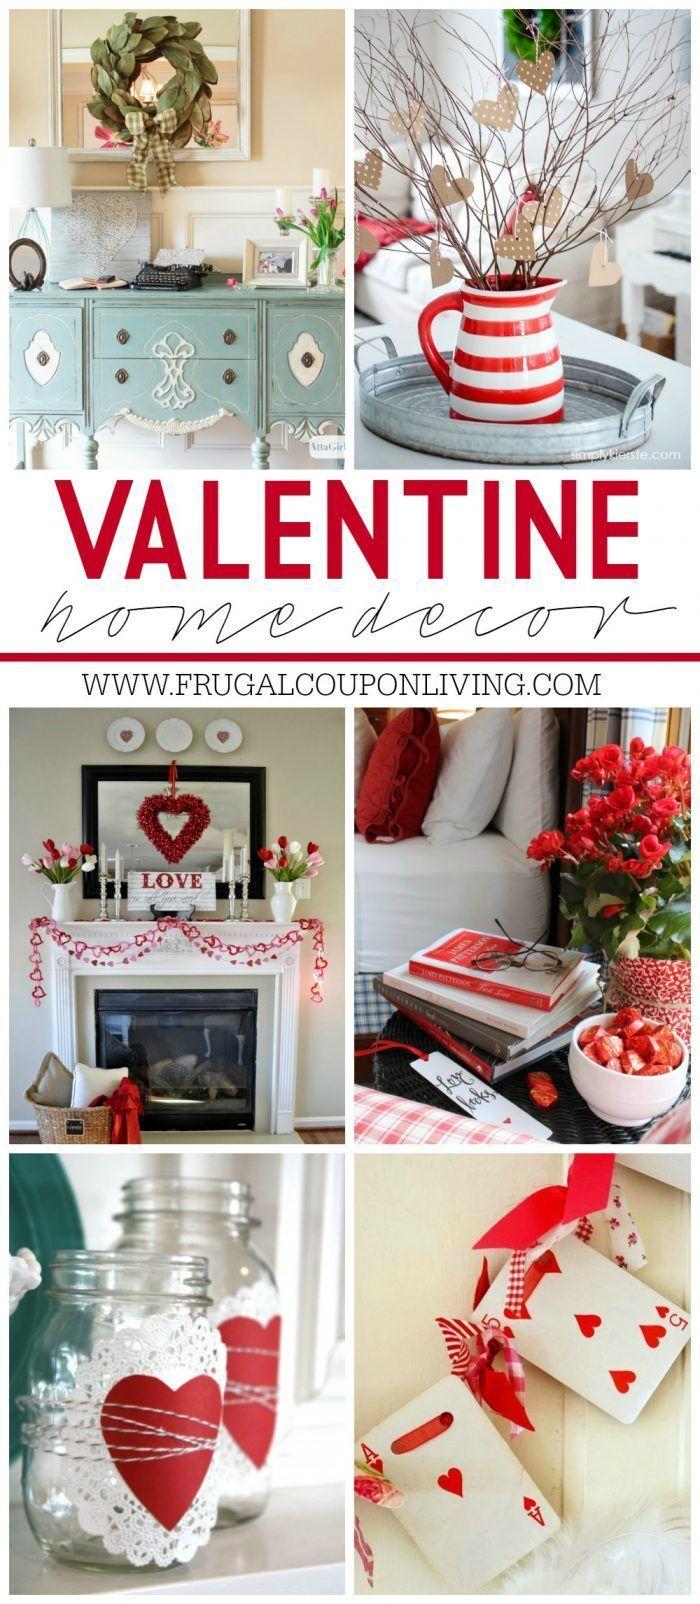 Valentine Home Decor Ideas on Frugal Coupon Living plus FREE Valentine's Day Pri...